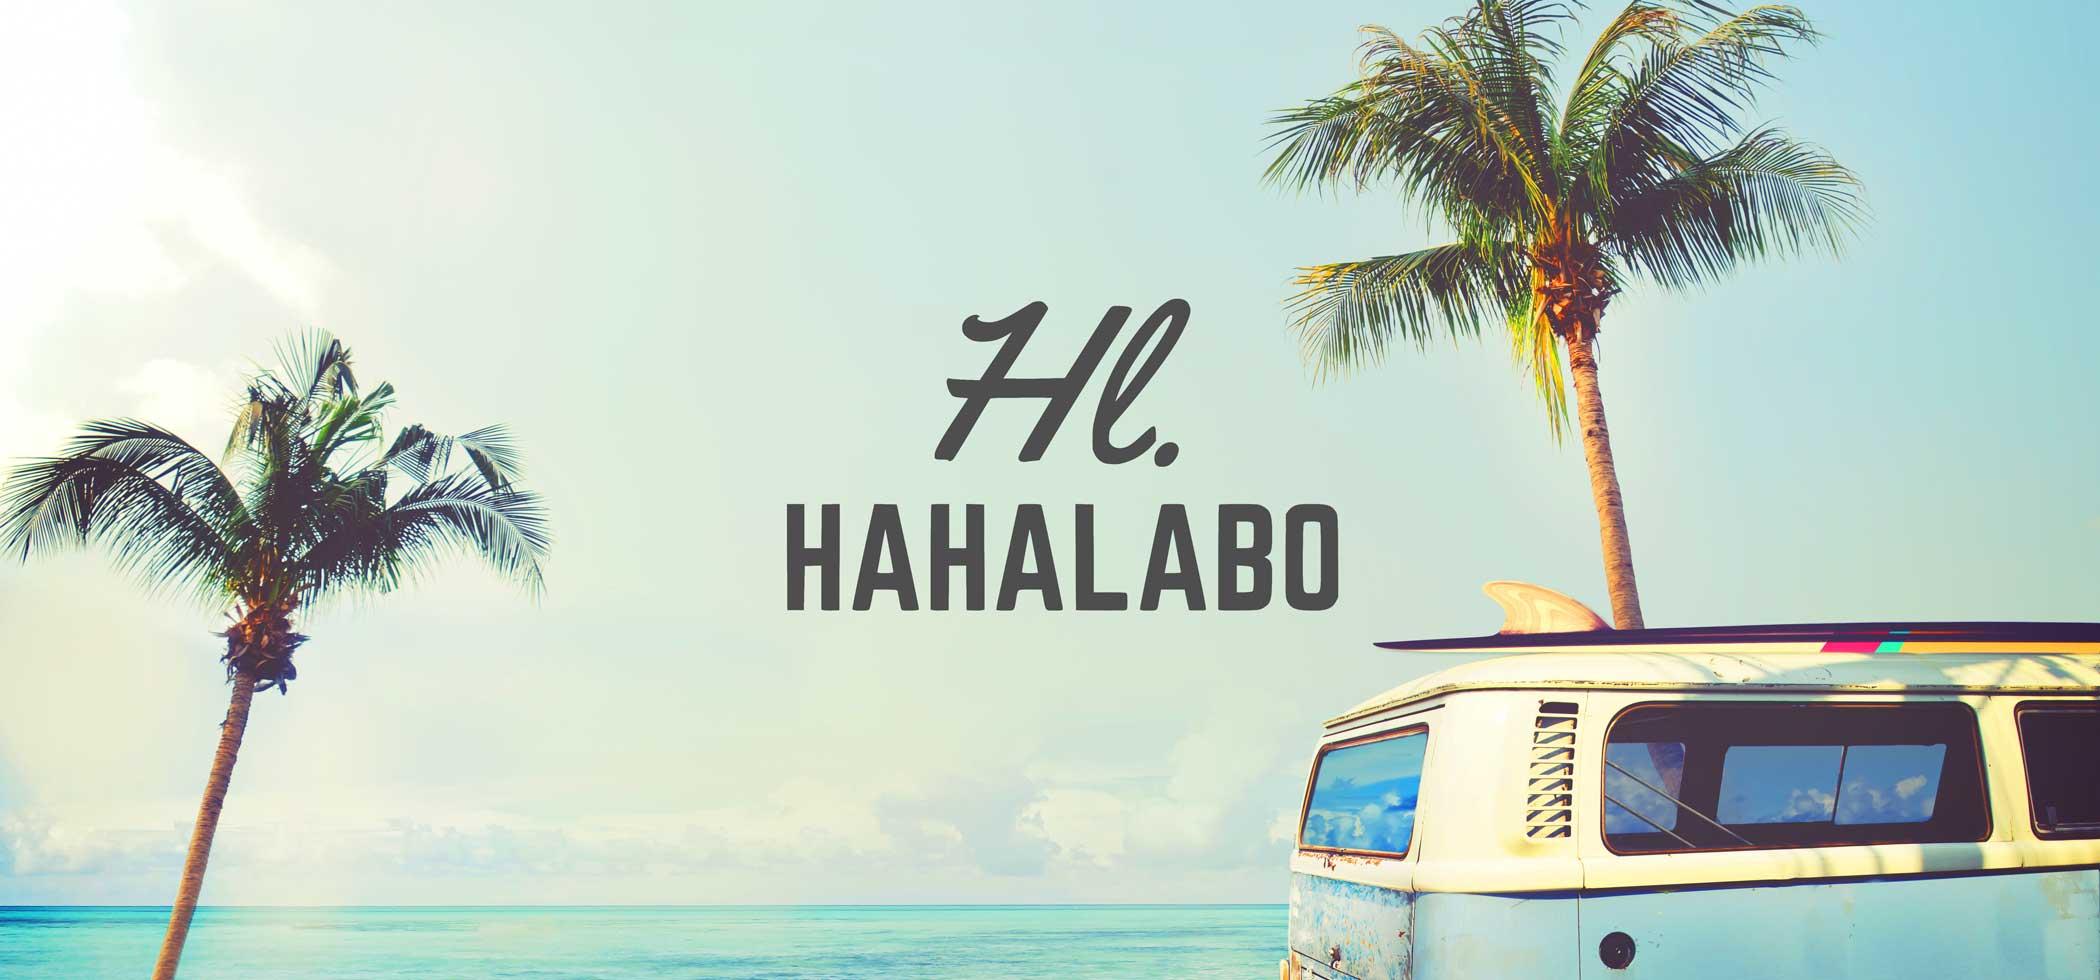 HAHALABO紹介画像1